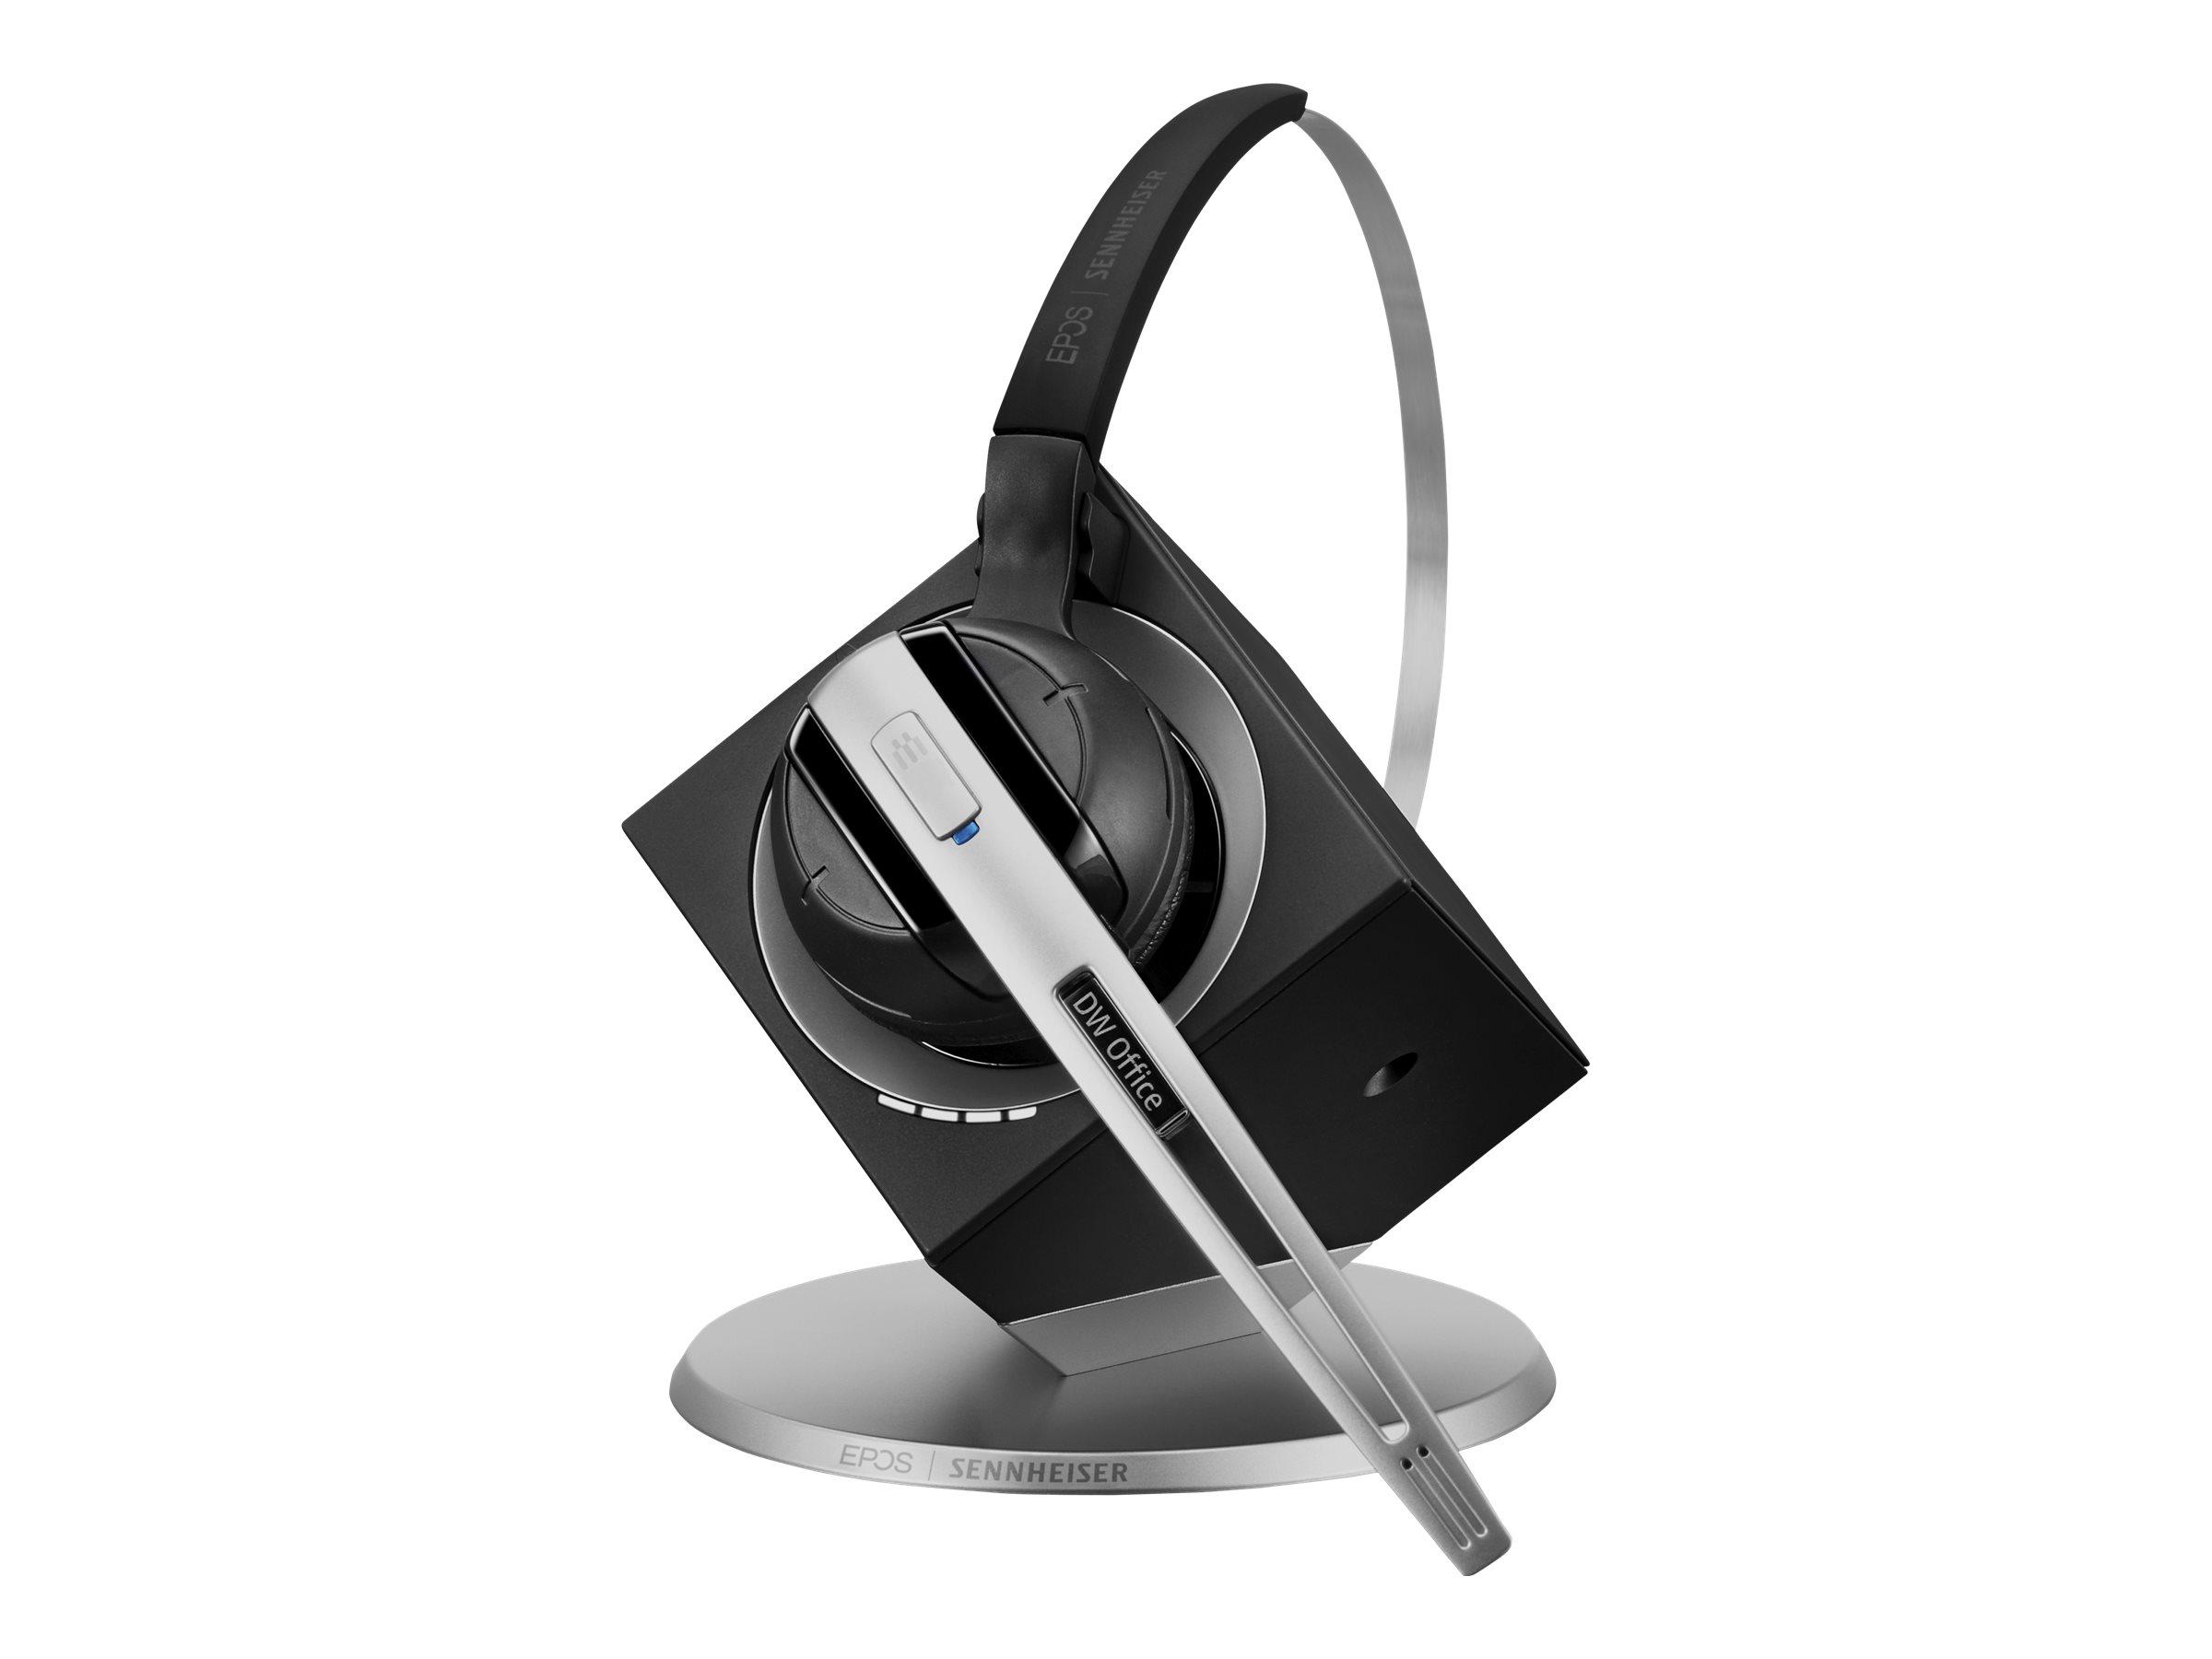 EPOS I SENNHEISER IMPACT DW 10 PHONE - Headset - konvertierbar - DECT CAT-iq - kabellos